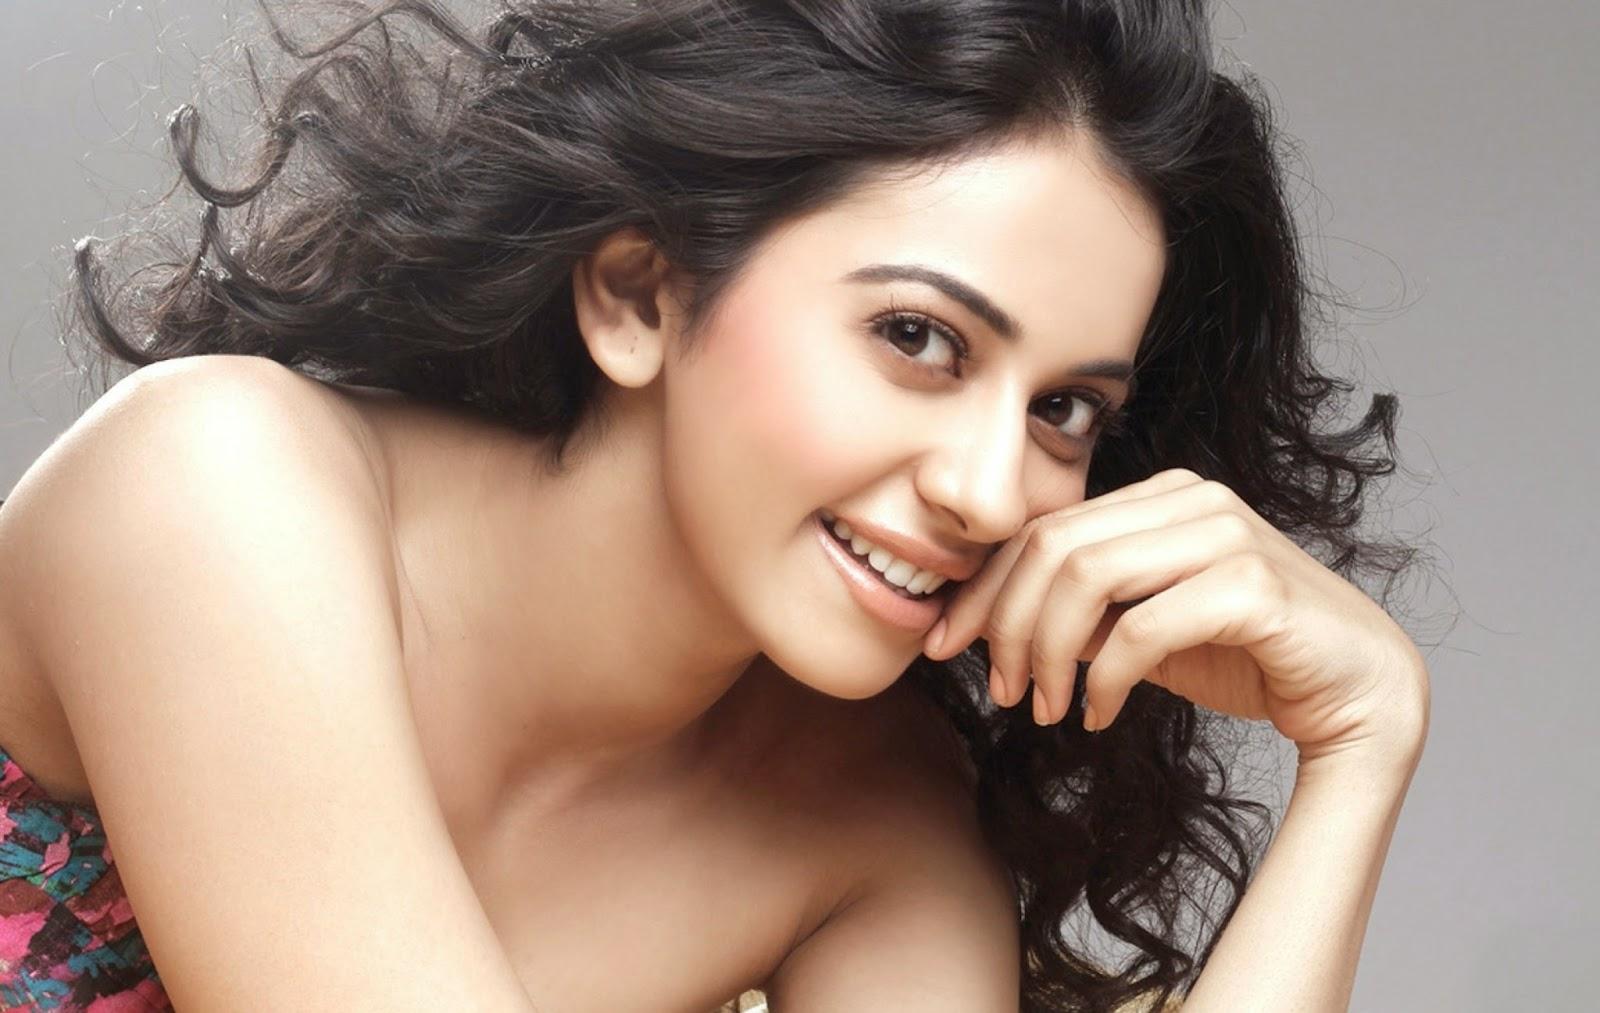 Gorgeous Rakul Preet Singh Pictures Hollywood Gossip